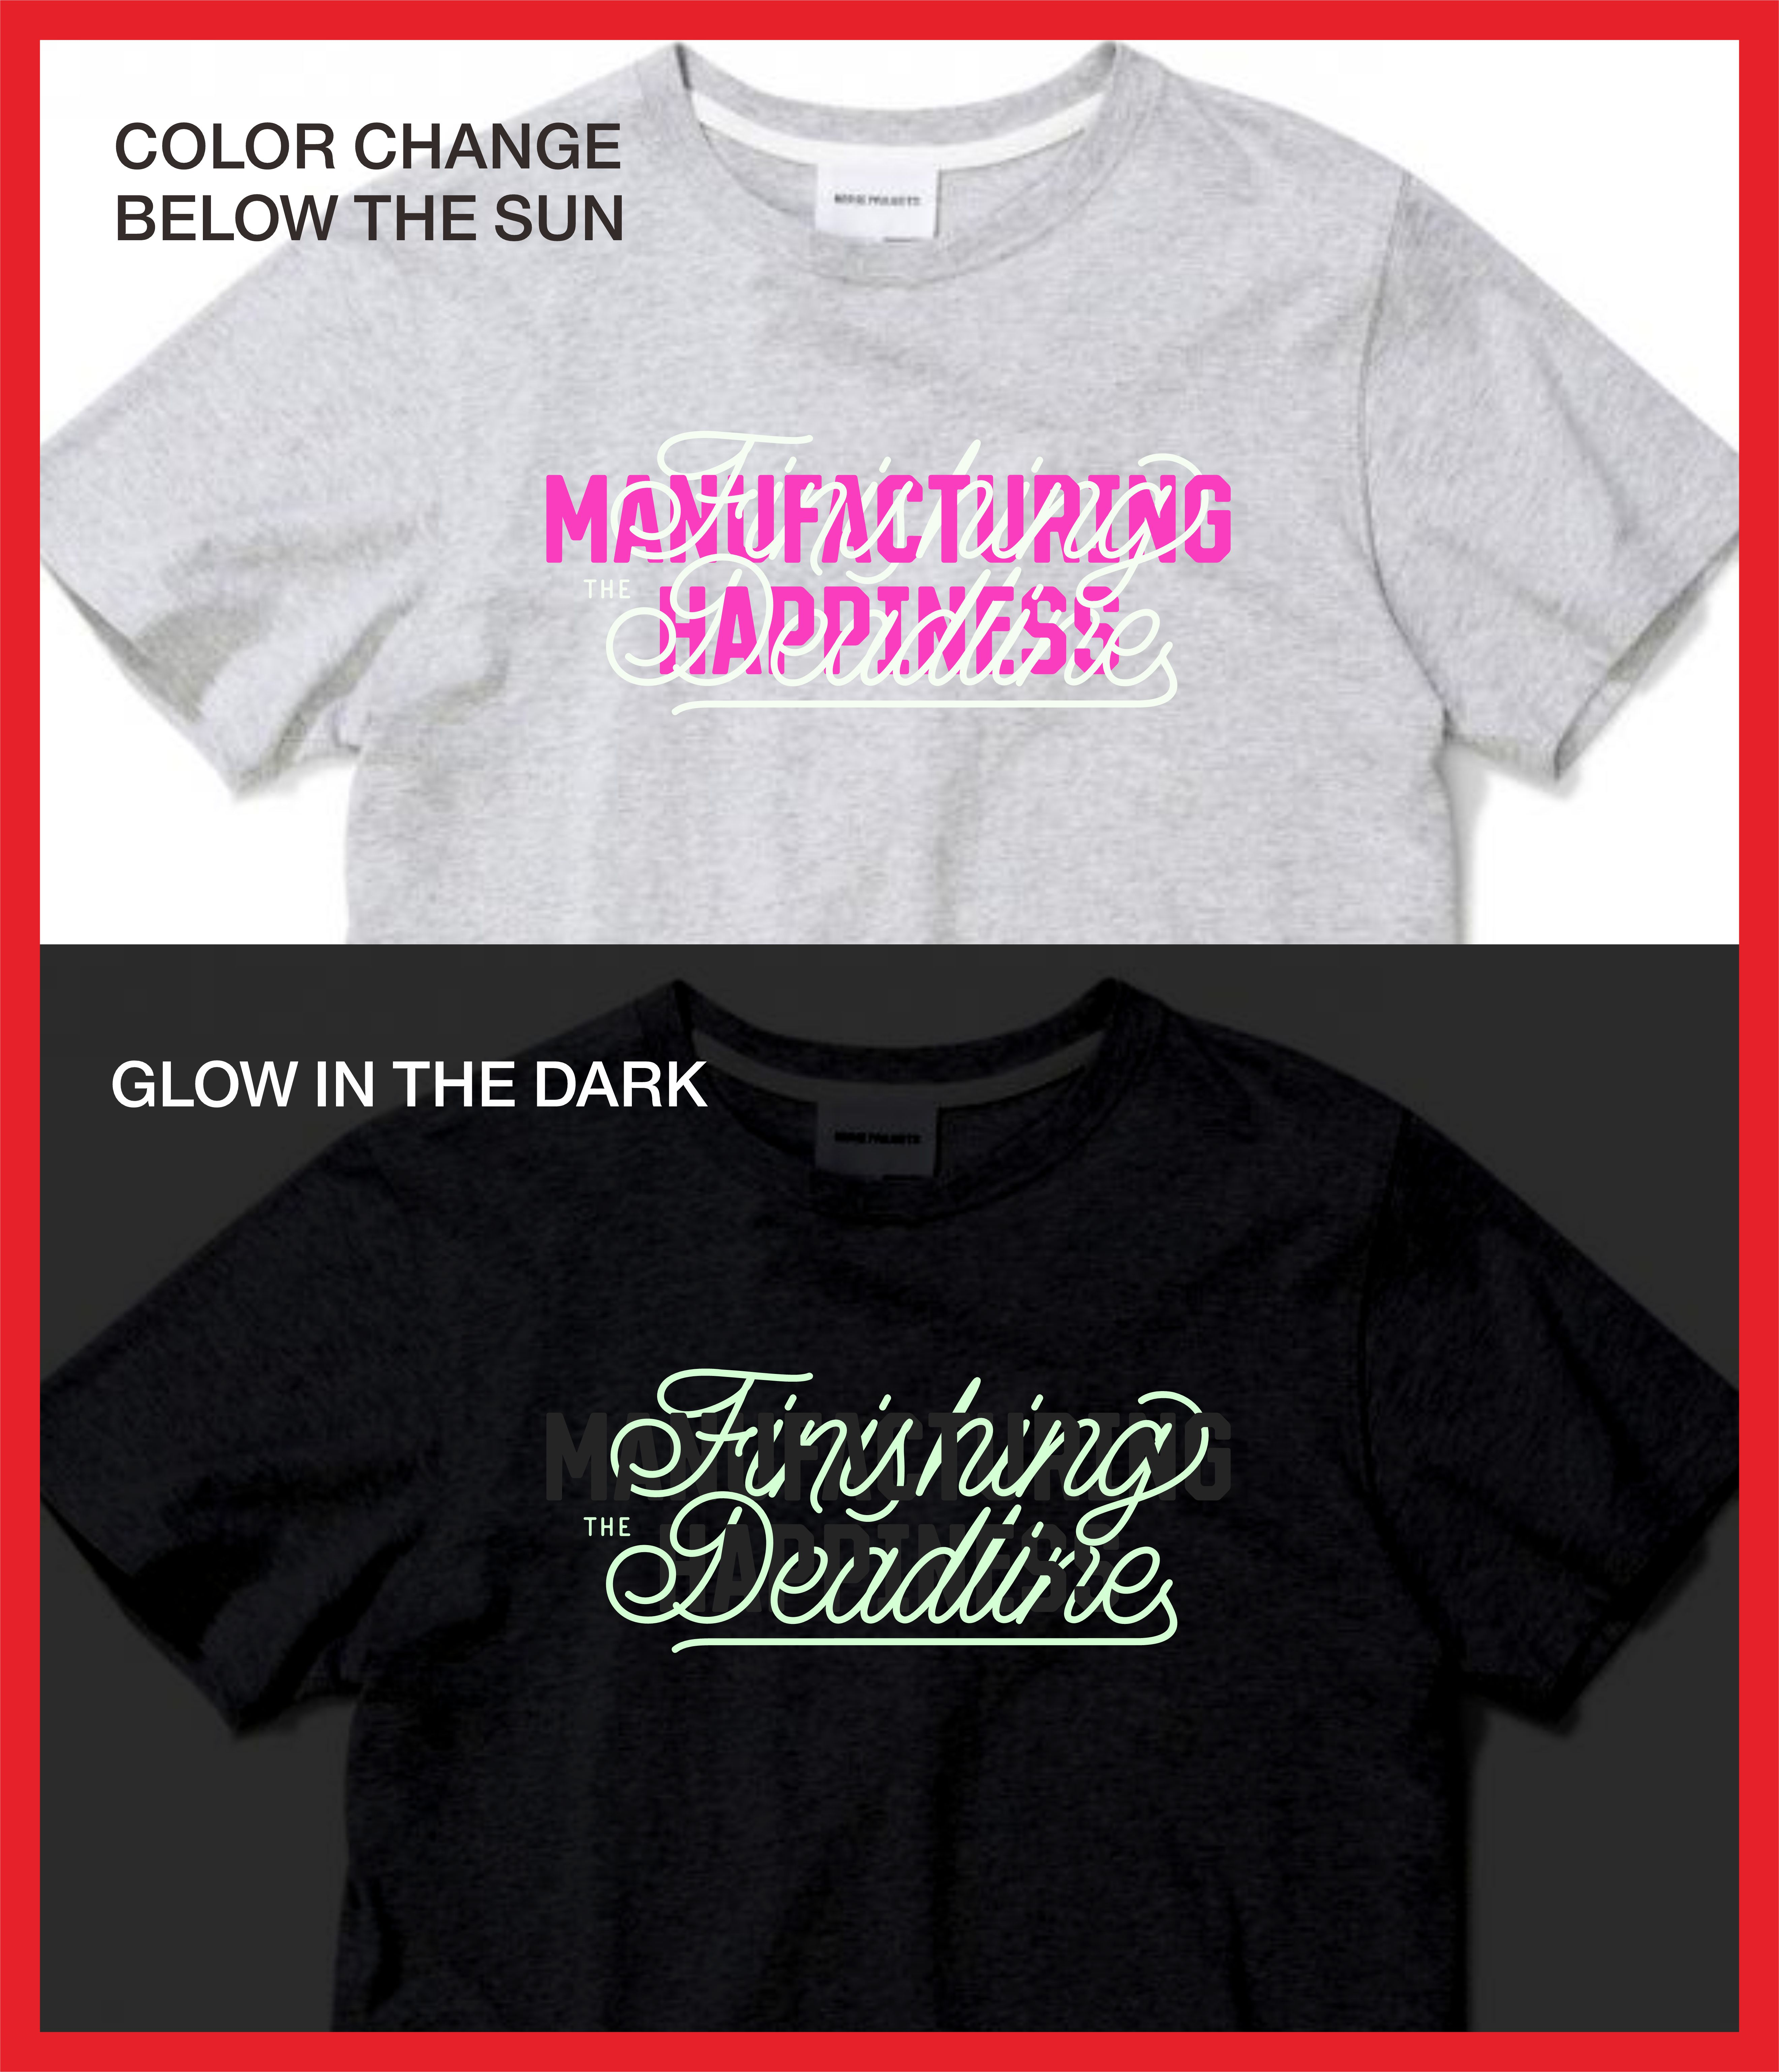 Bukan Sekedar Kaos, 3 Merchandise Unggulan S&S ini Wajib Kamu Miliki Sekarang